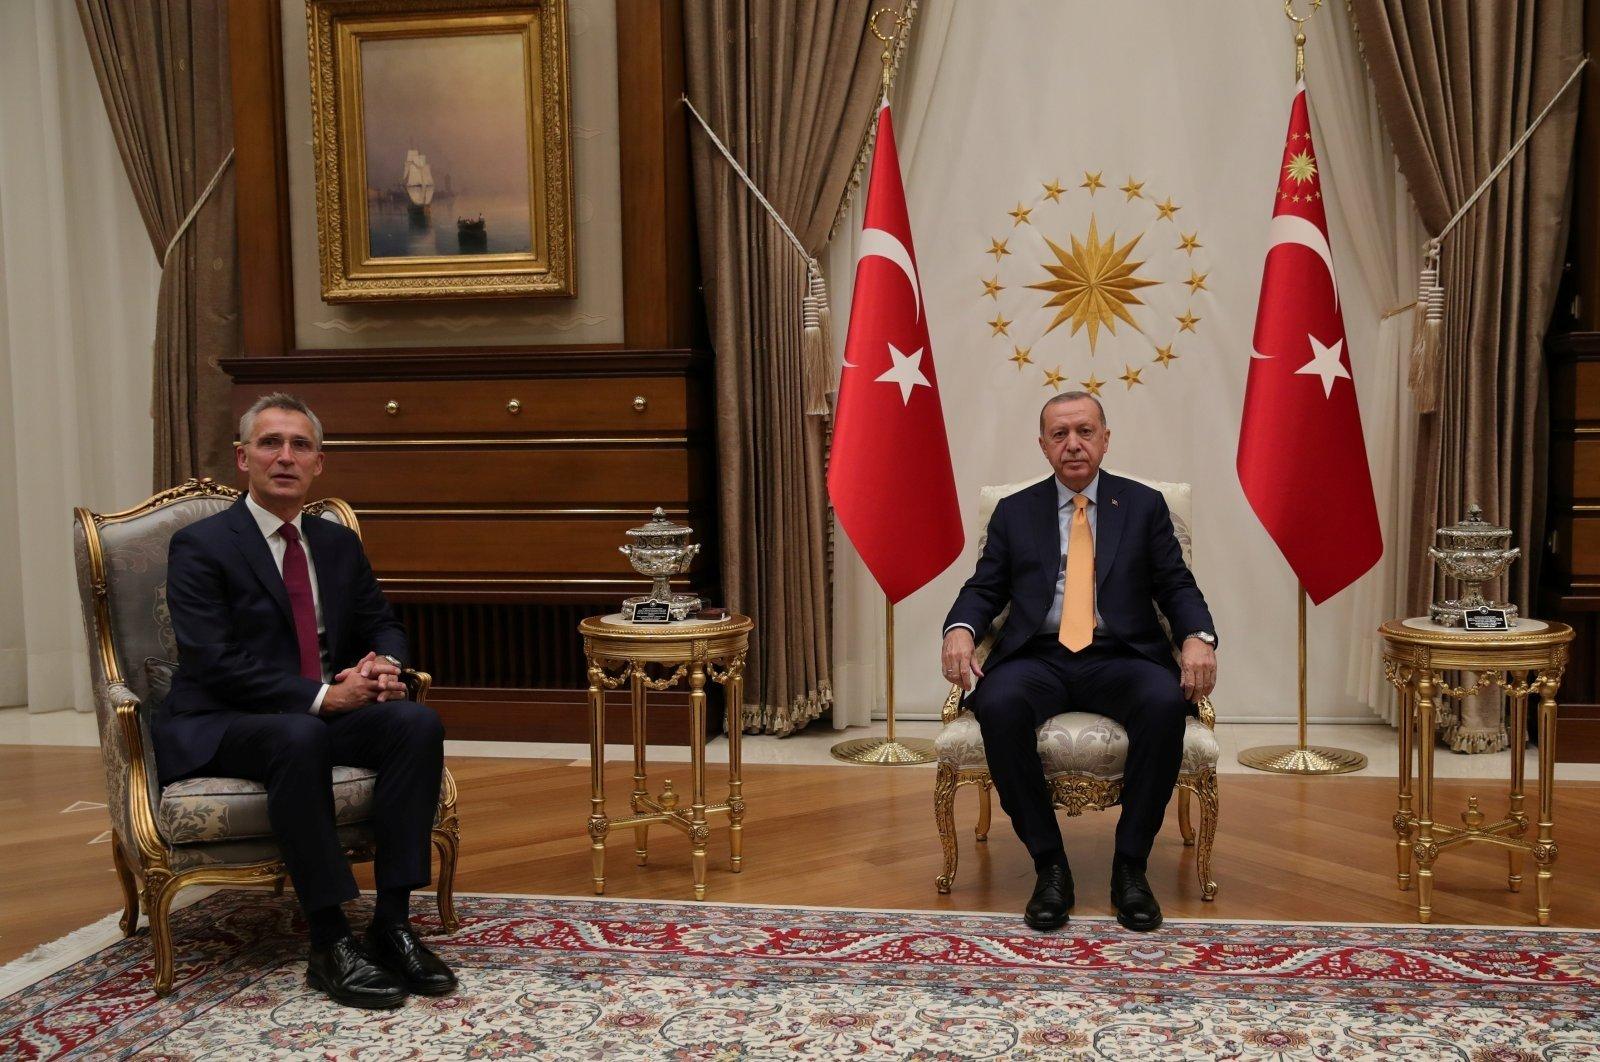 President Tayyip Erdoğan meets with NATO Secretary-General Jens Stoltenberg in Ankara, Turkey, Oct. 5, 2020. (Reuters Photo)